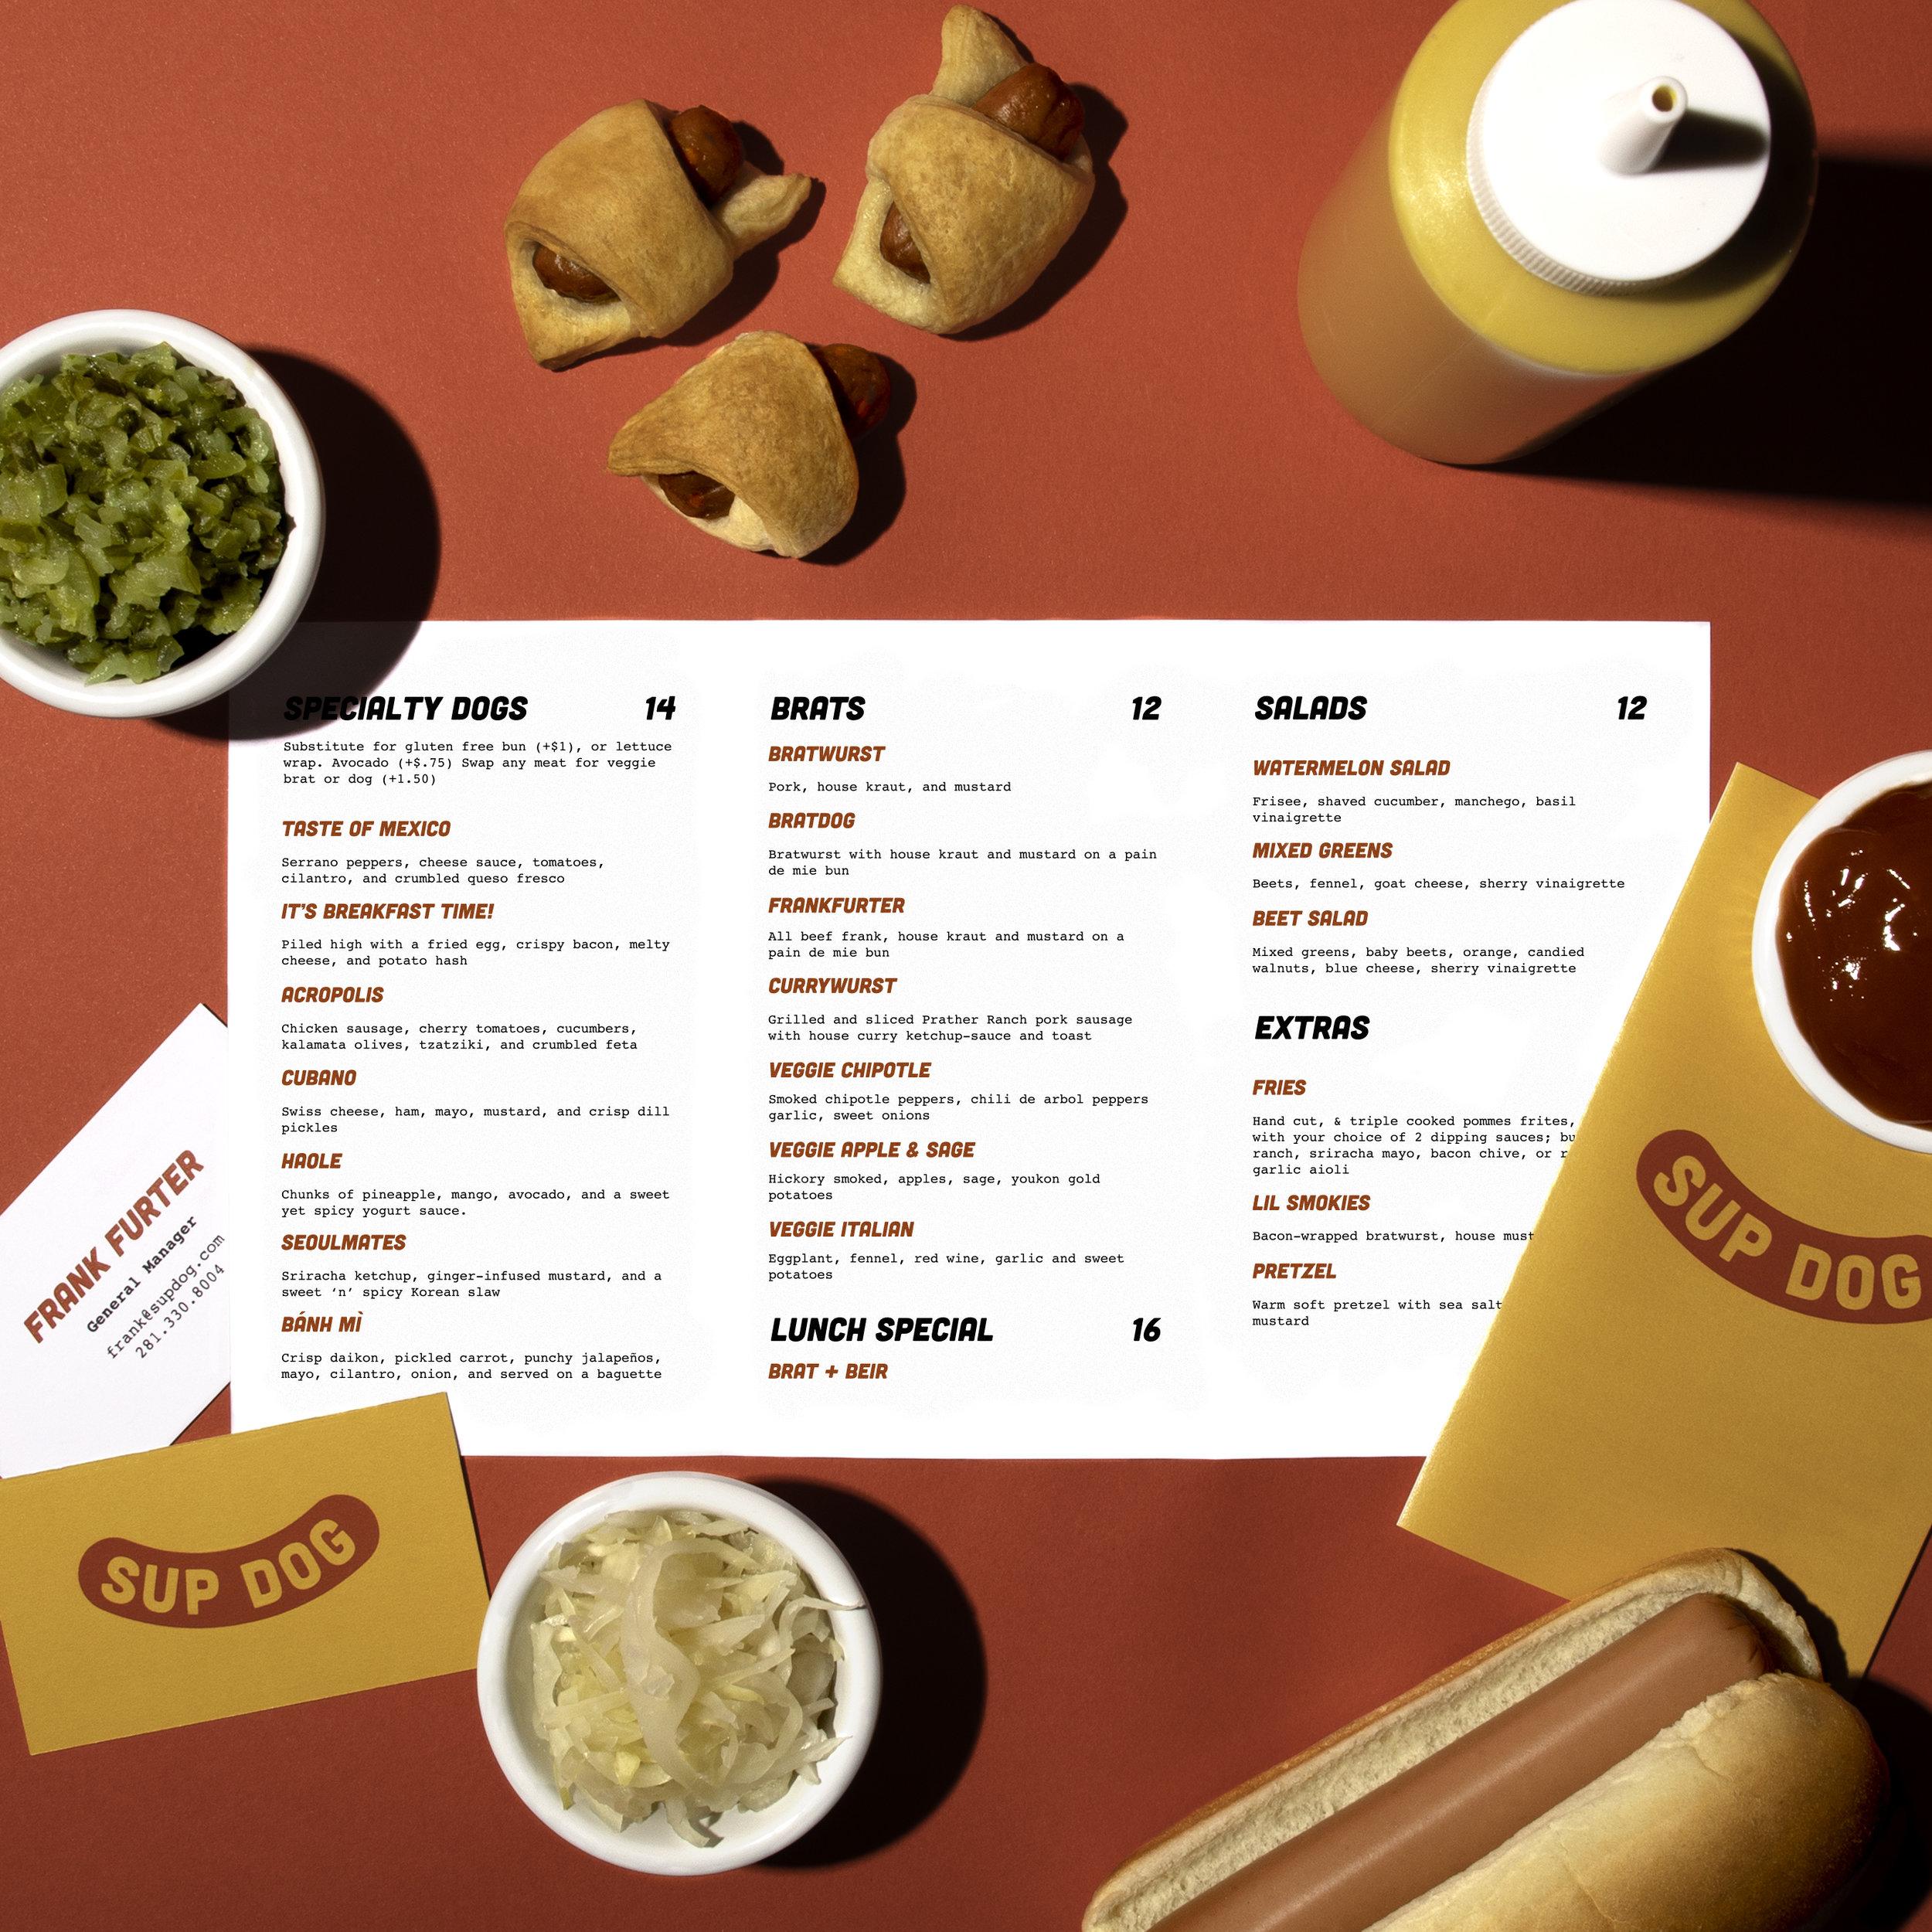 Sup Dog Menu design and photography